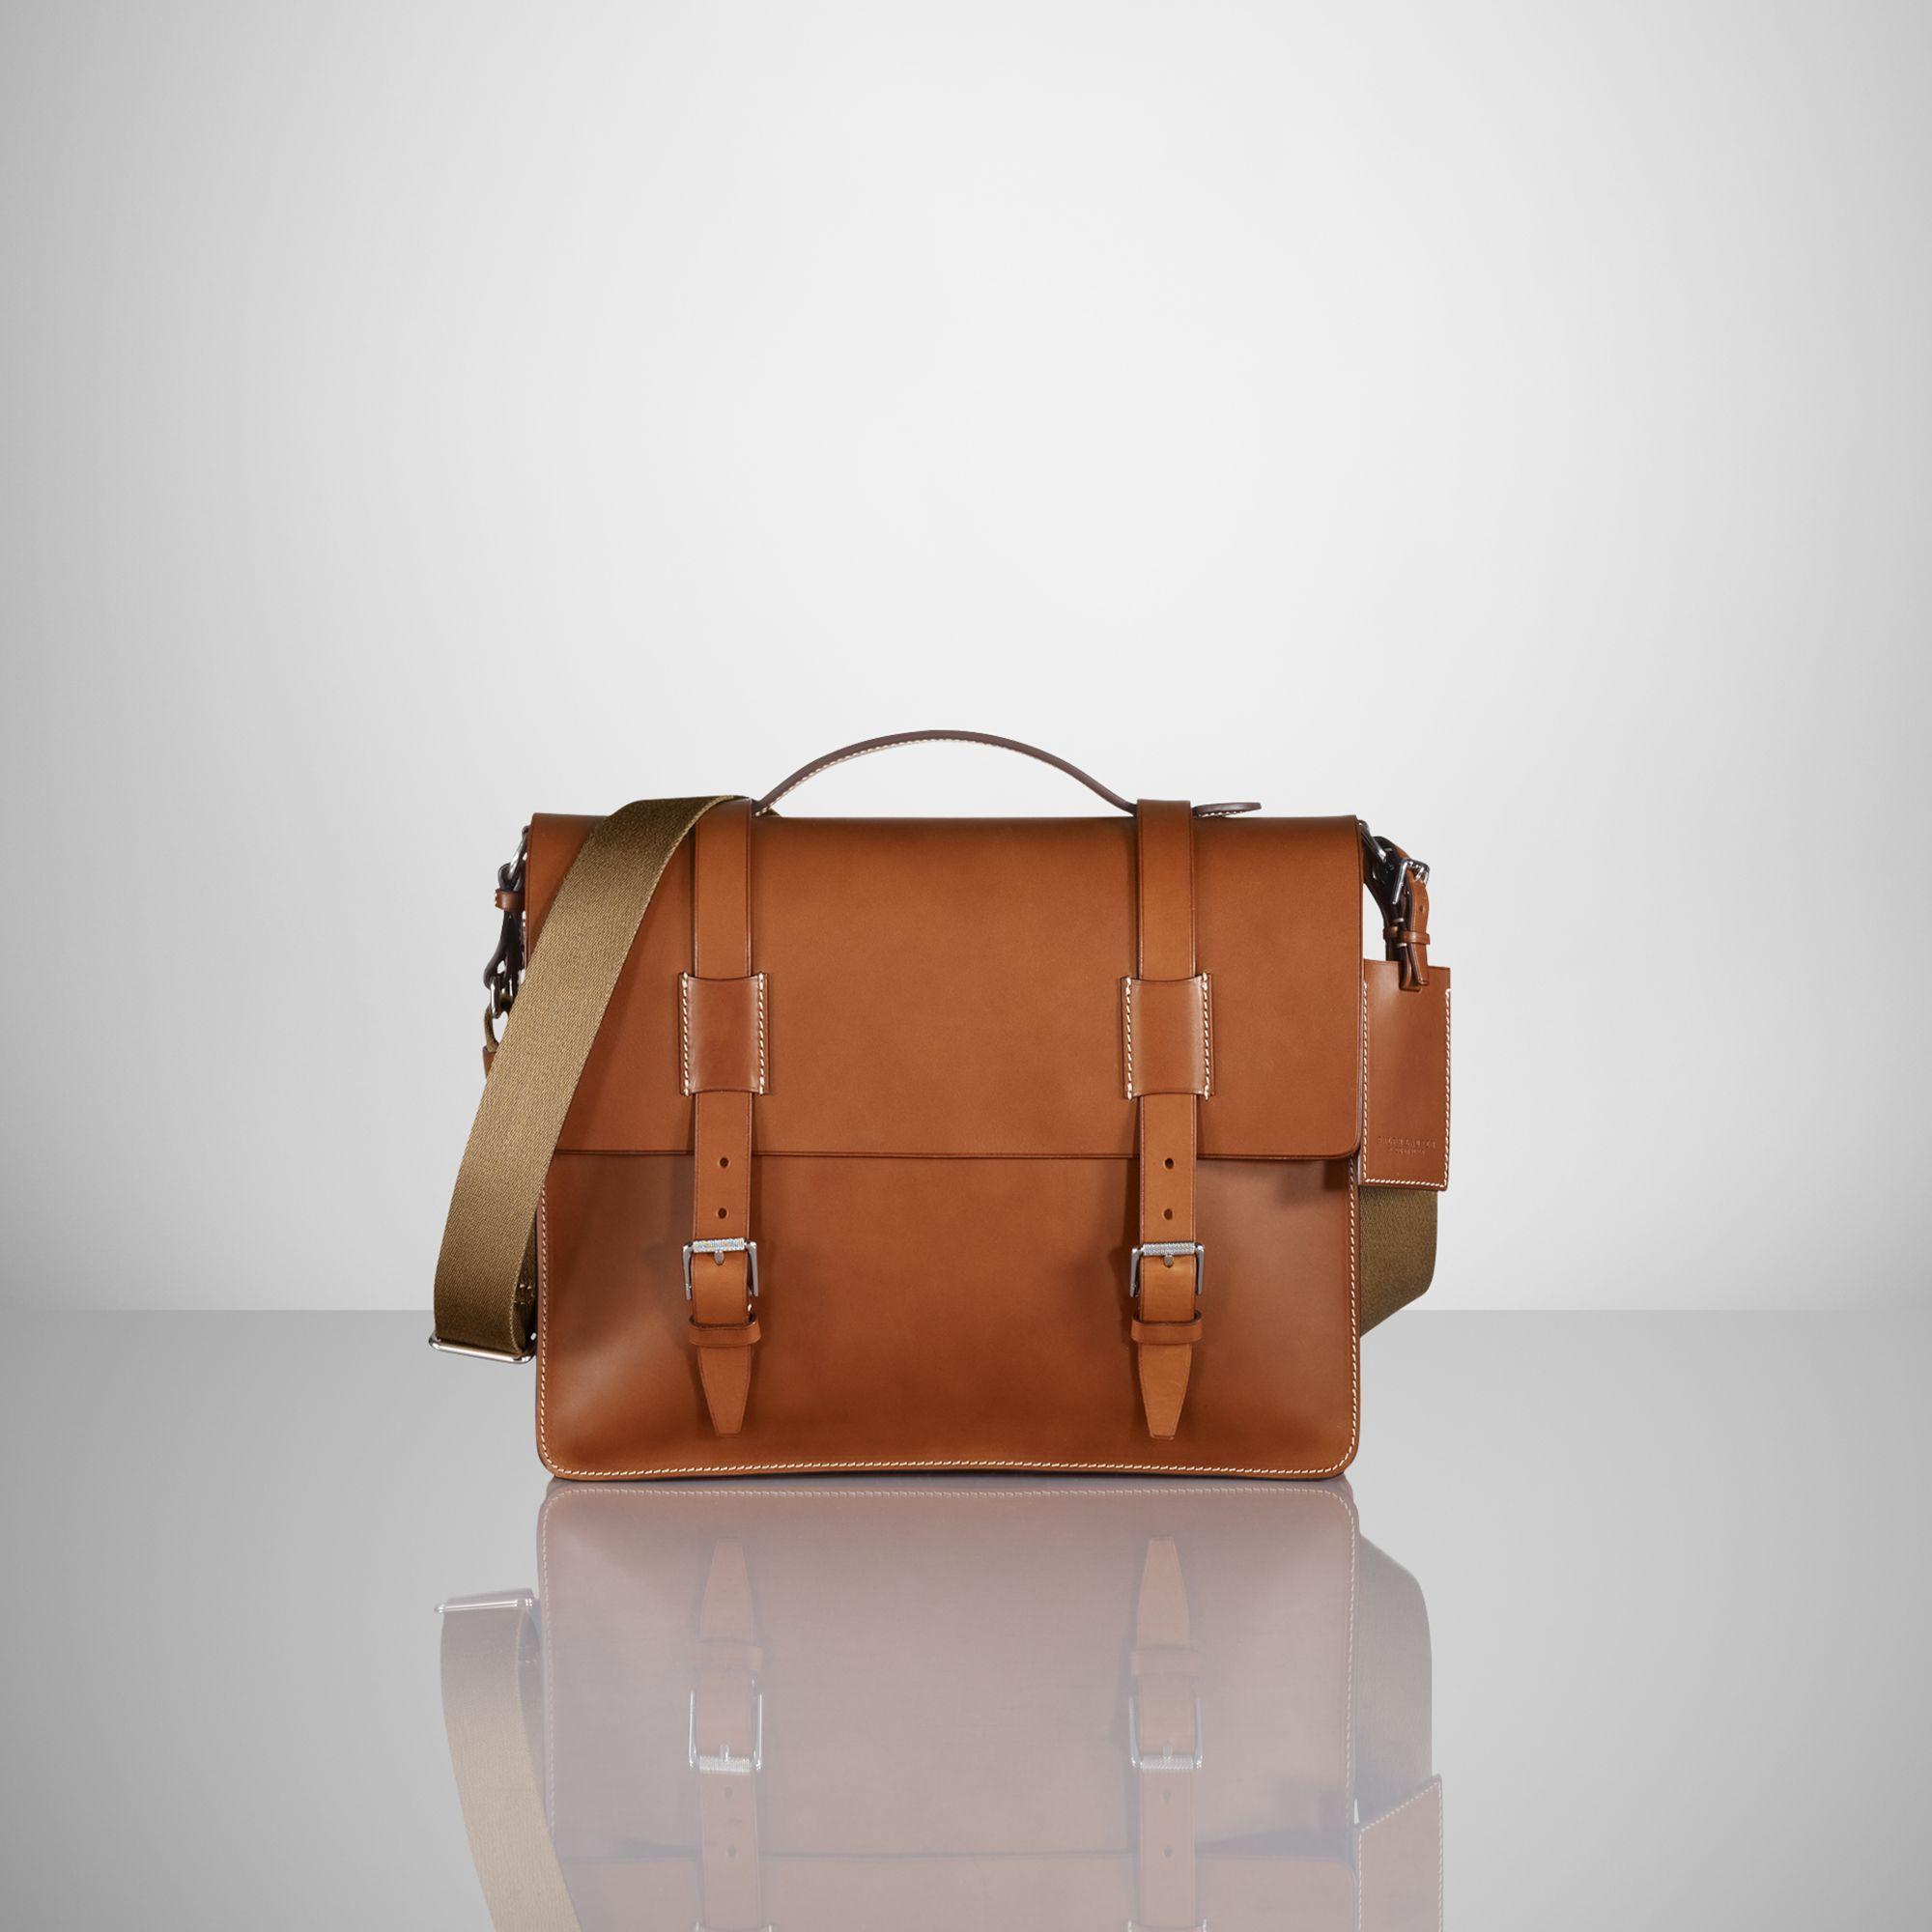 Leather Messenger Bag Patterns Free Google Search Messenger